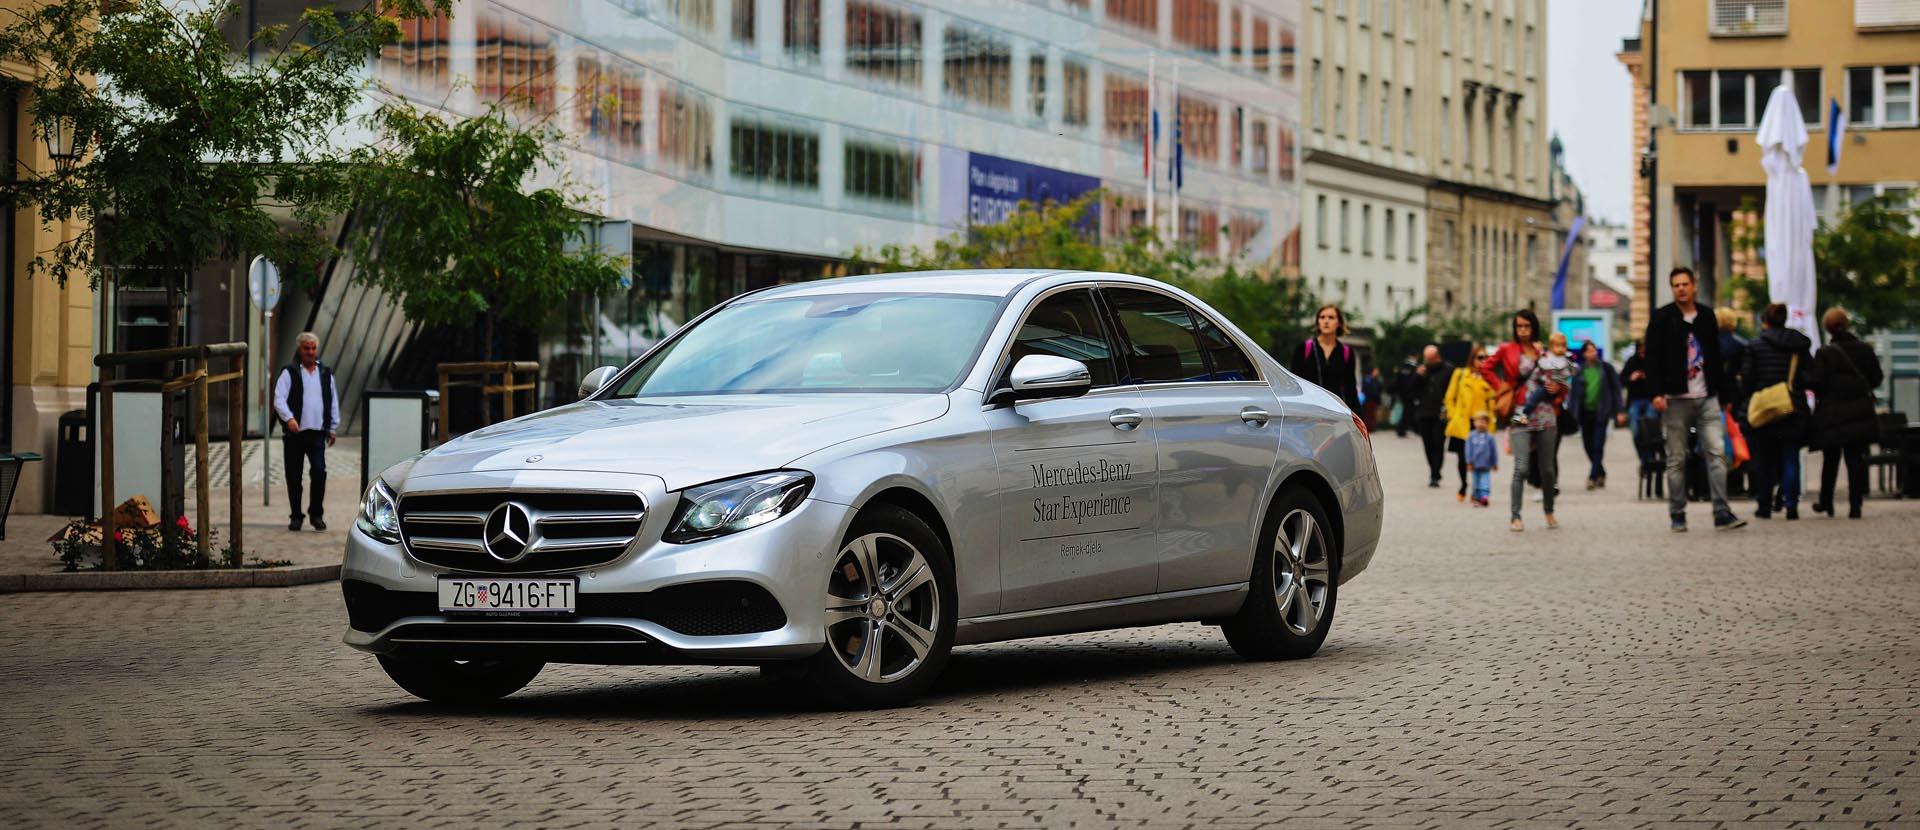 TEST Revolucija desete generacije: Mercedes E220d Edition 1